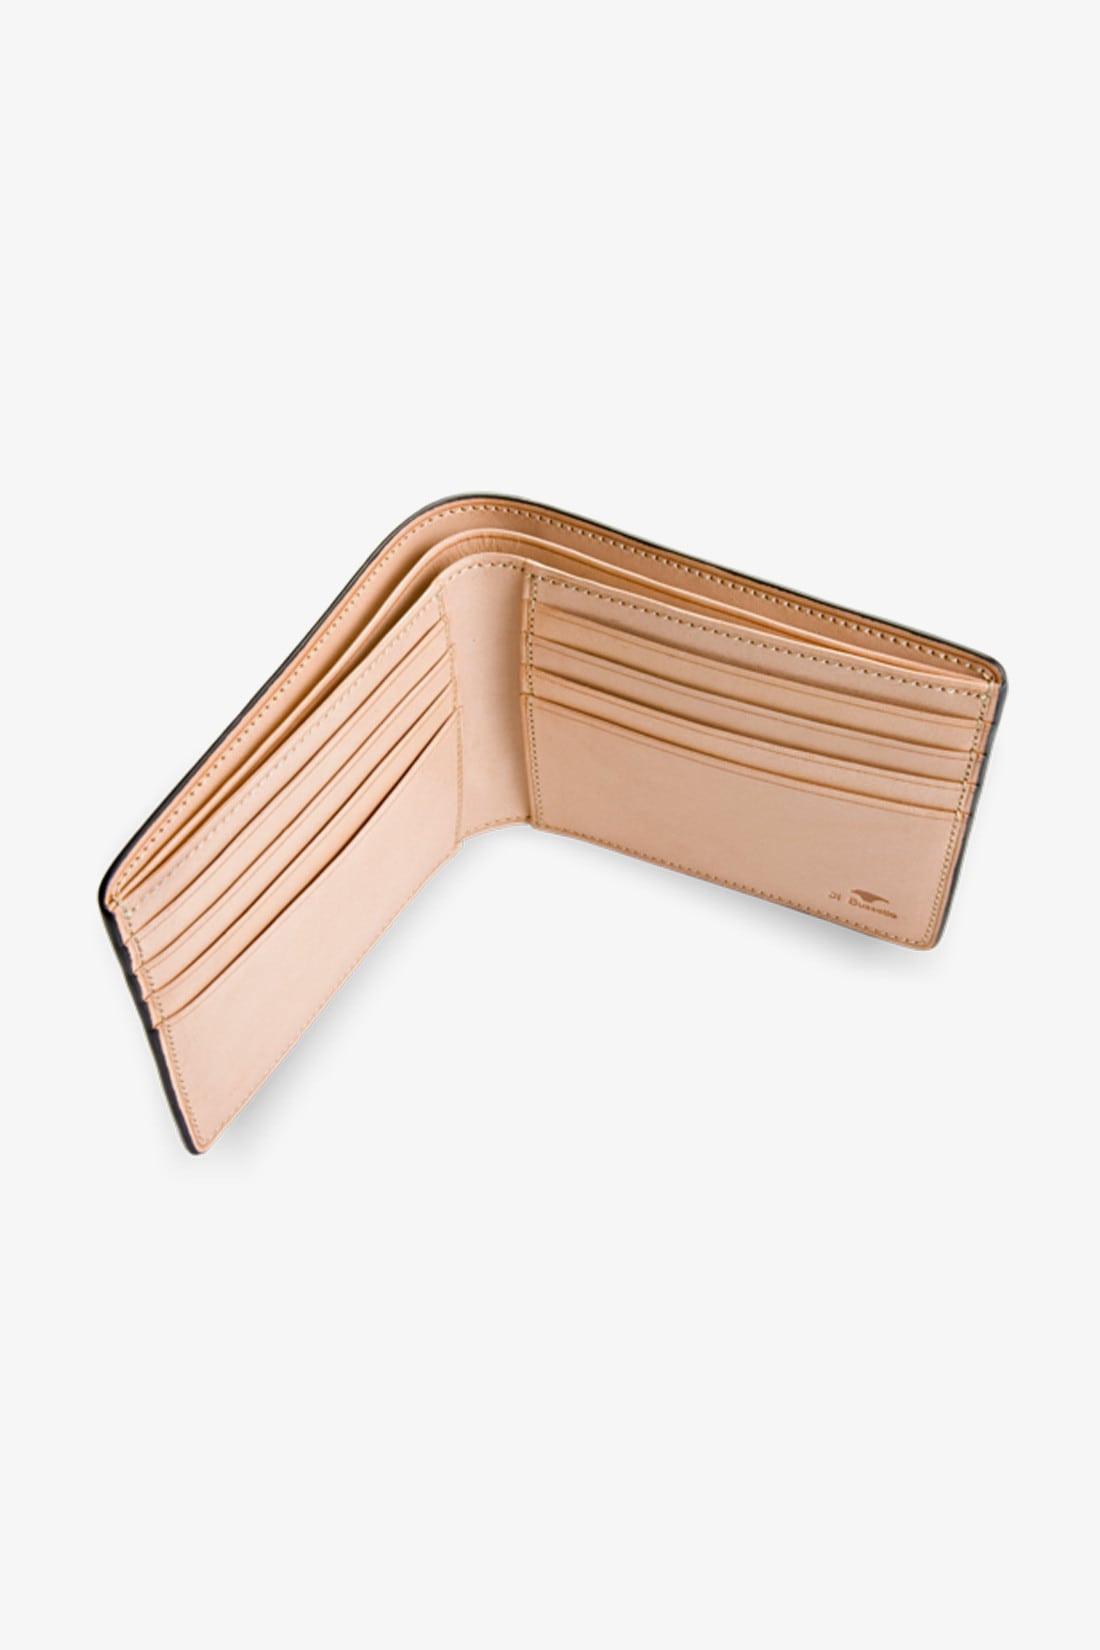 IL BUSSETTO / Bi-fold wallet w/ 8 card slots Forest green